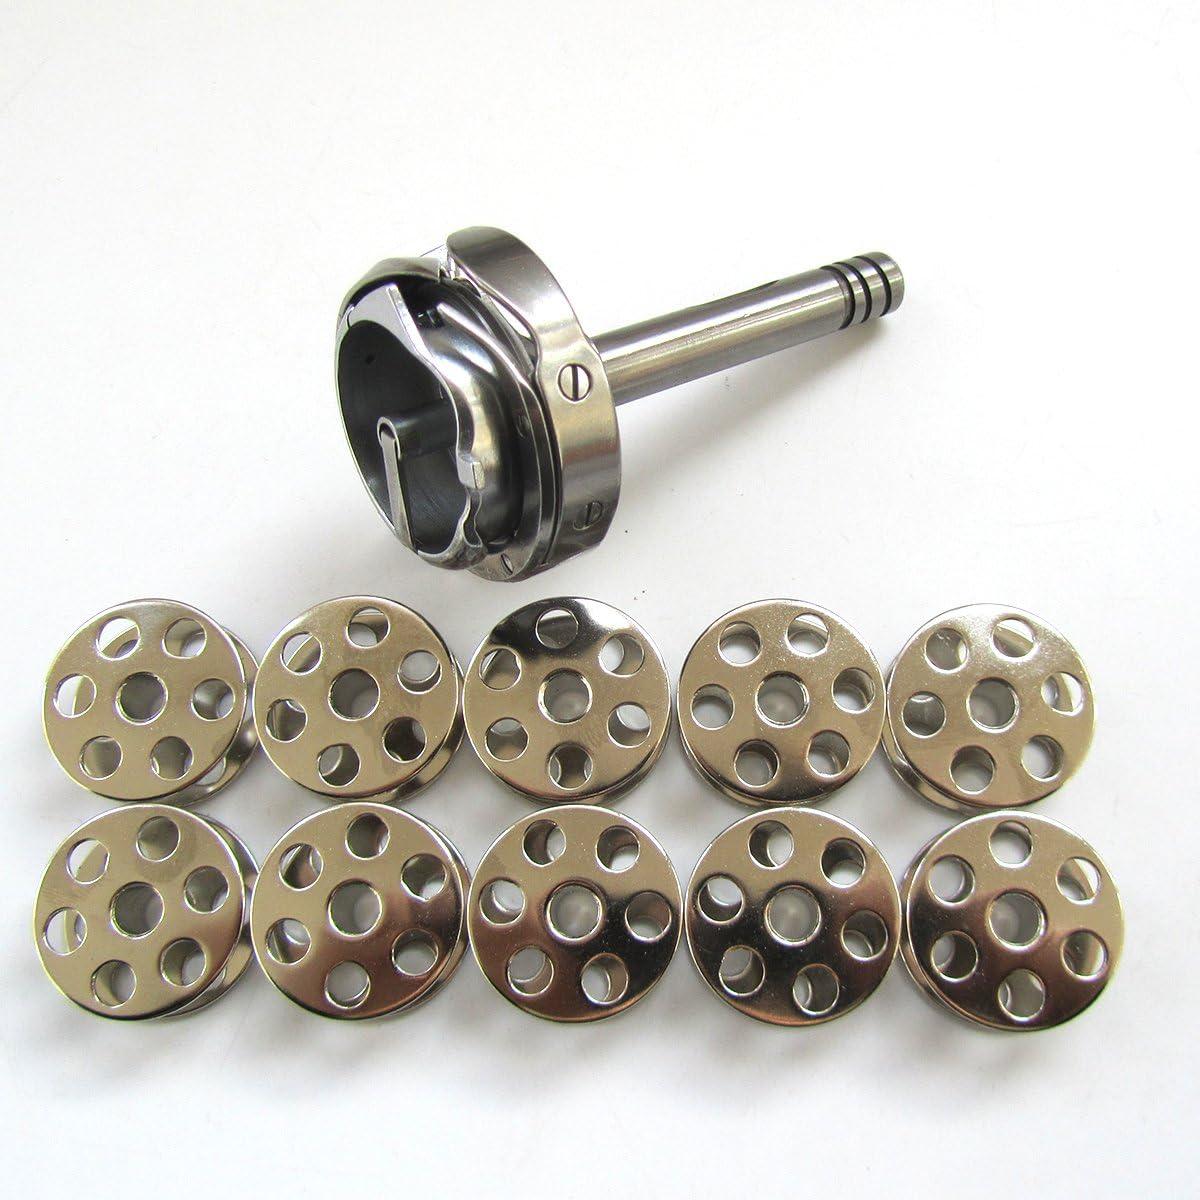 KUNPENG Rotary Hook #HSH-12-15MMJ //B1830-563-0A0 1PCS fit for JUKI 563 1508 1510 1560 Artisan 4400RB